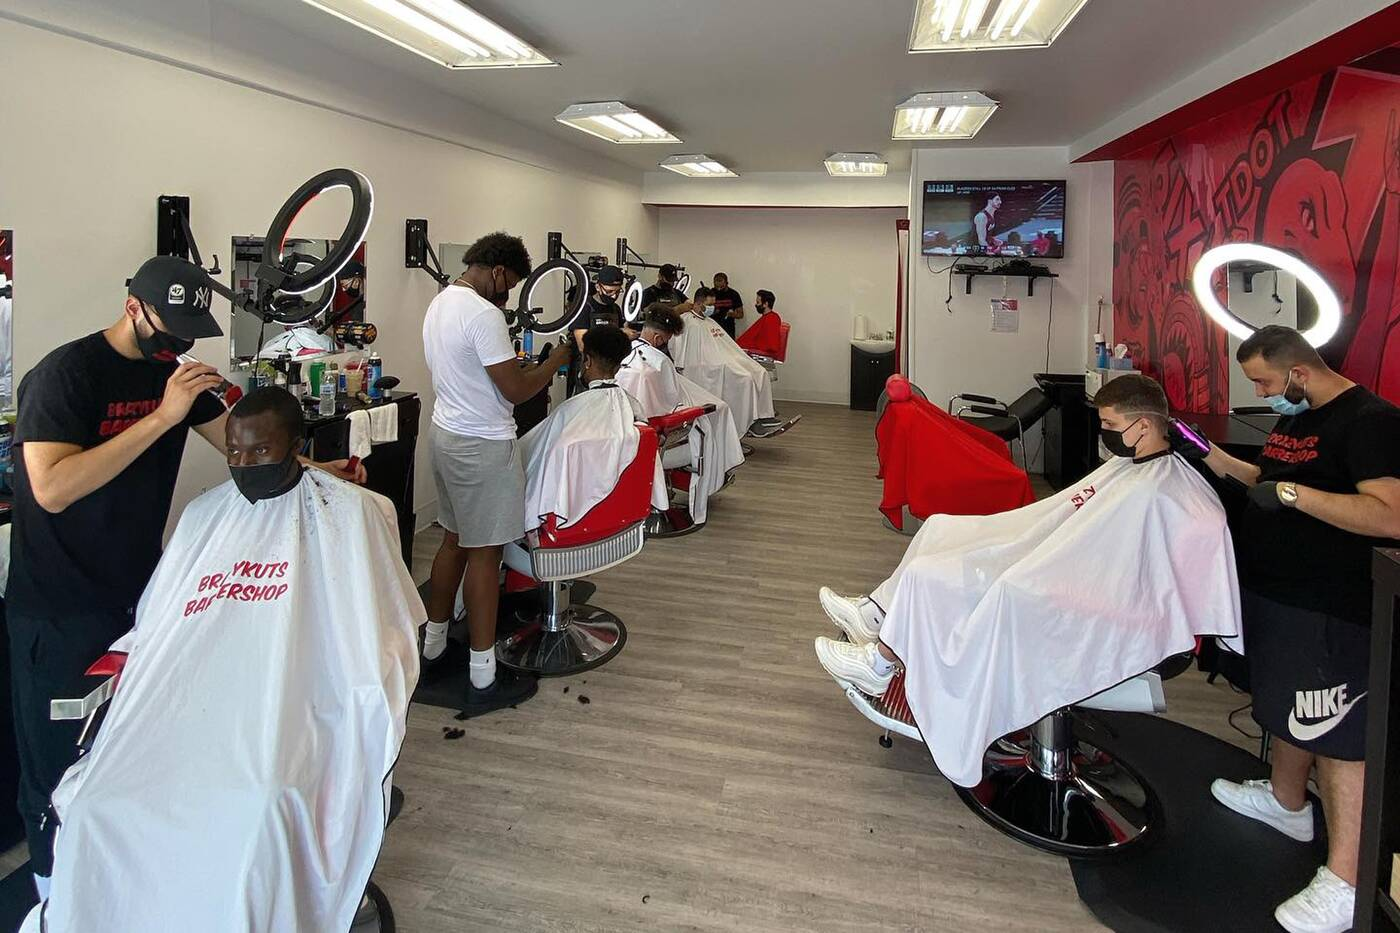 brazycuts barbershop